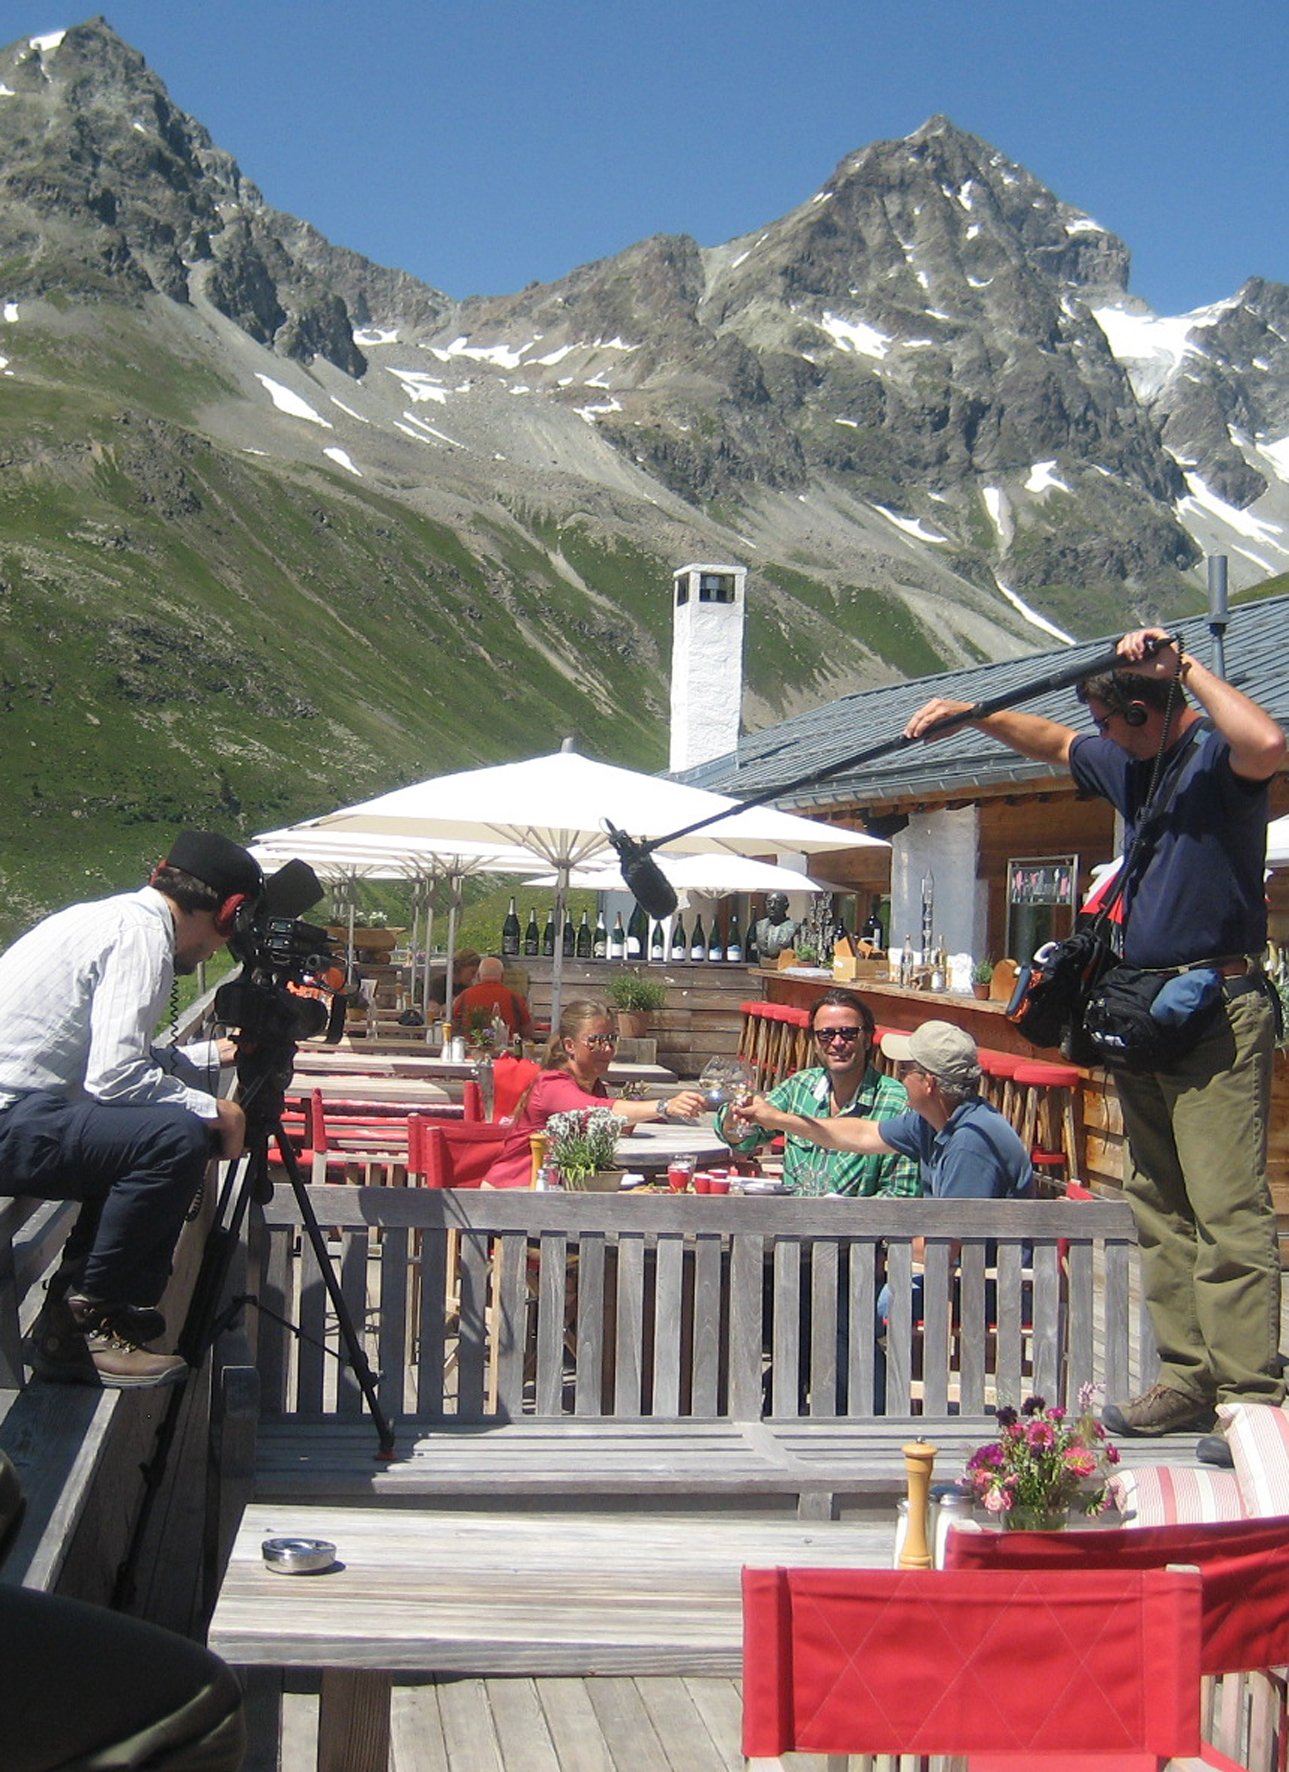 Sendung über Engadin St. Moritz über 3000 Mal ausgestrahlt Slide 1